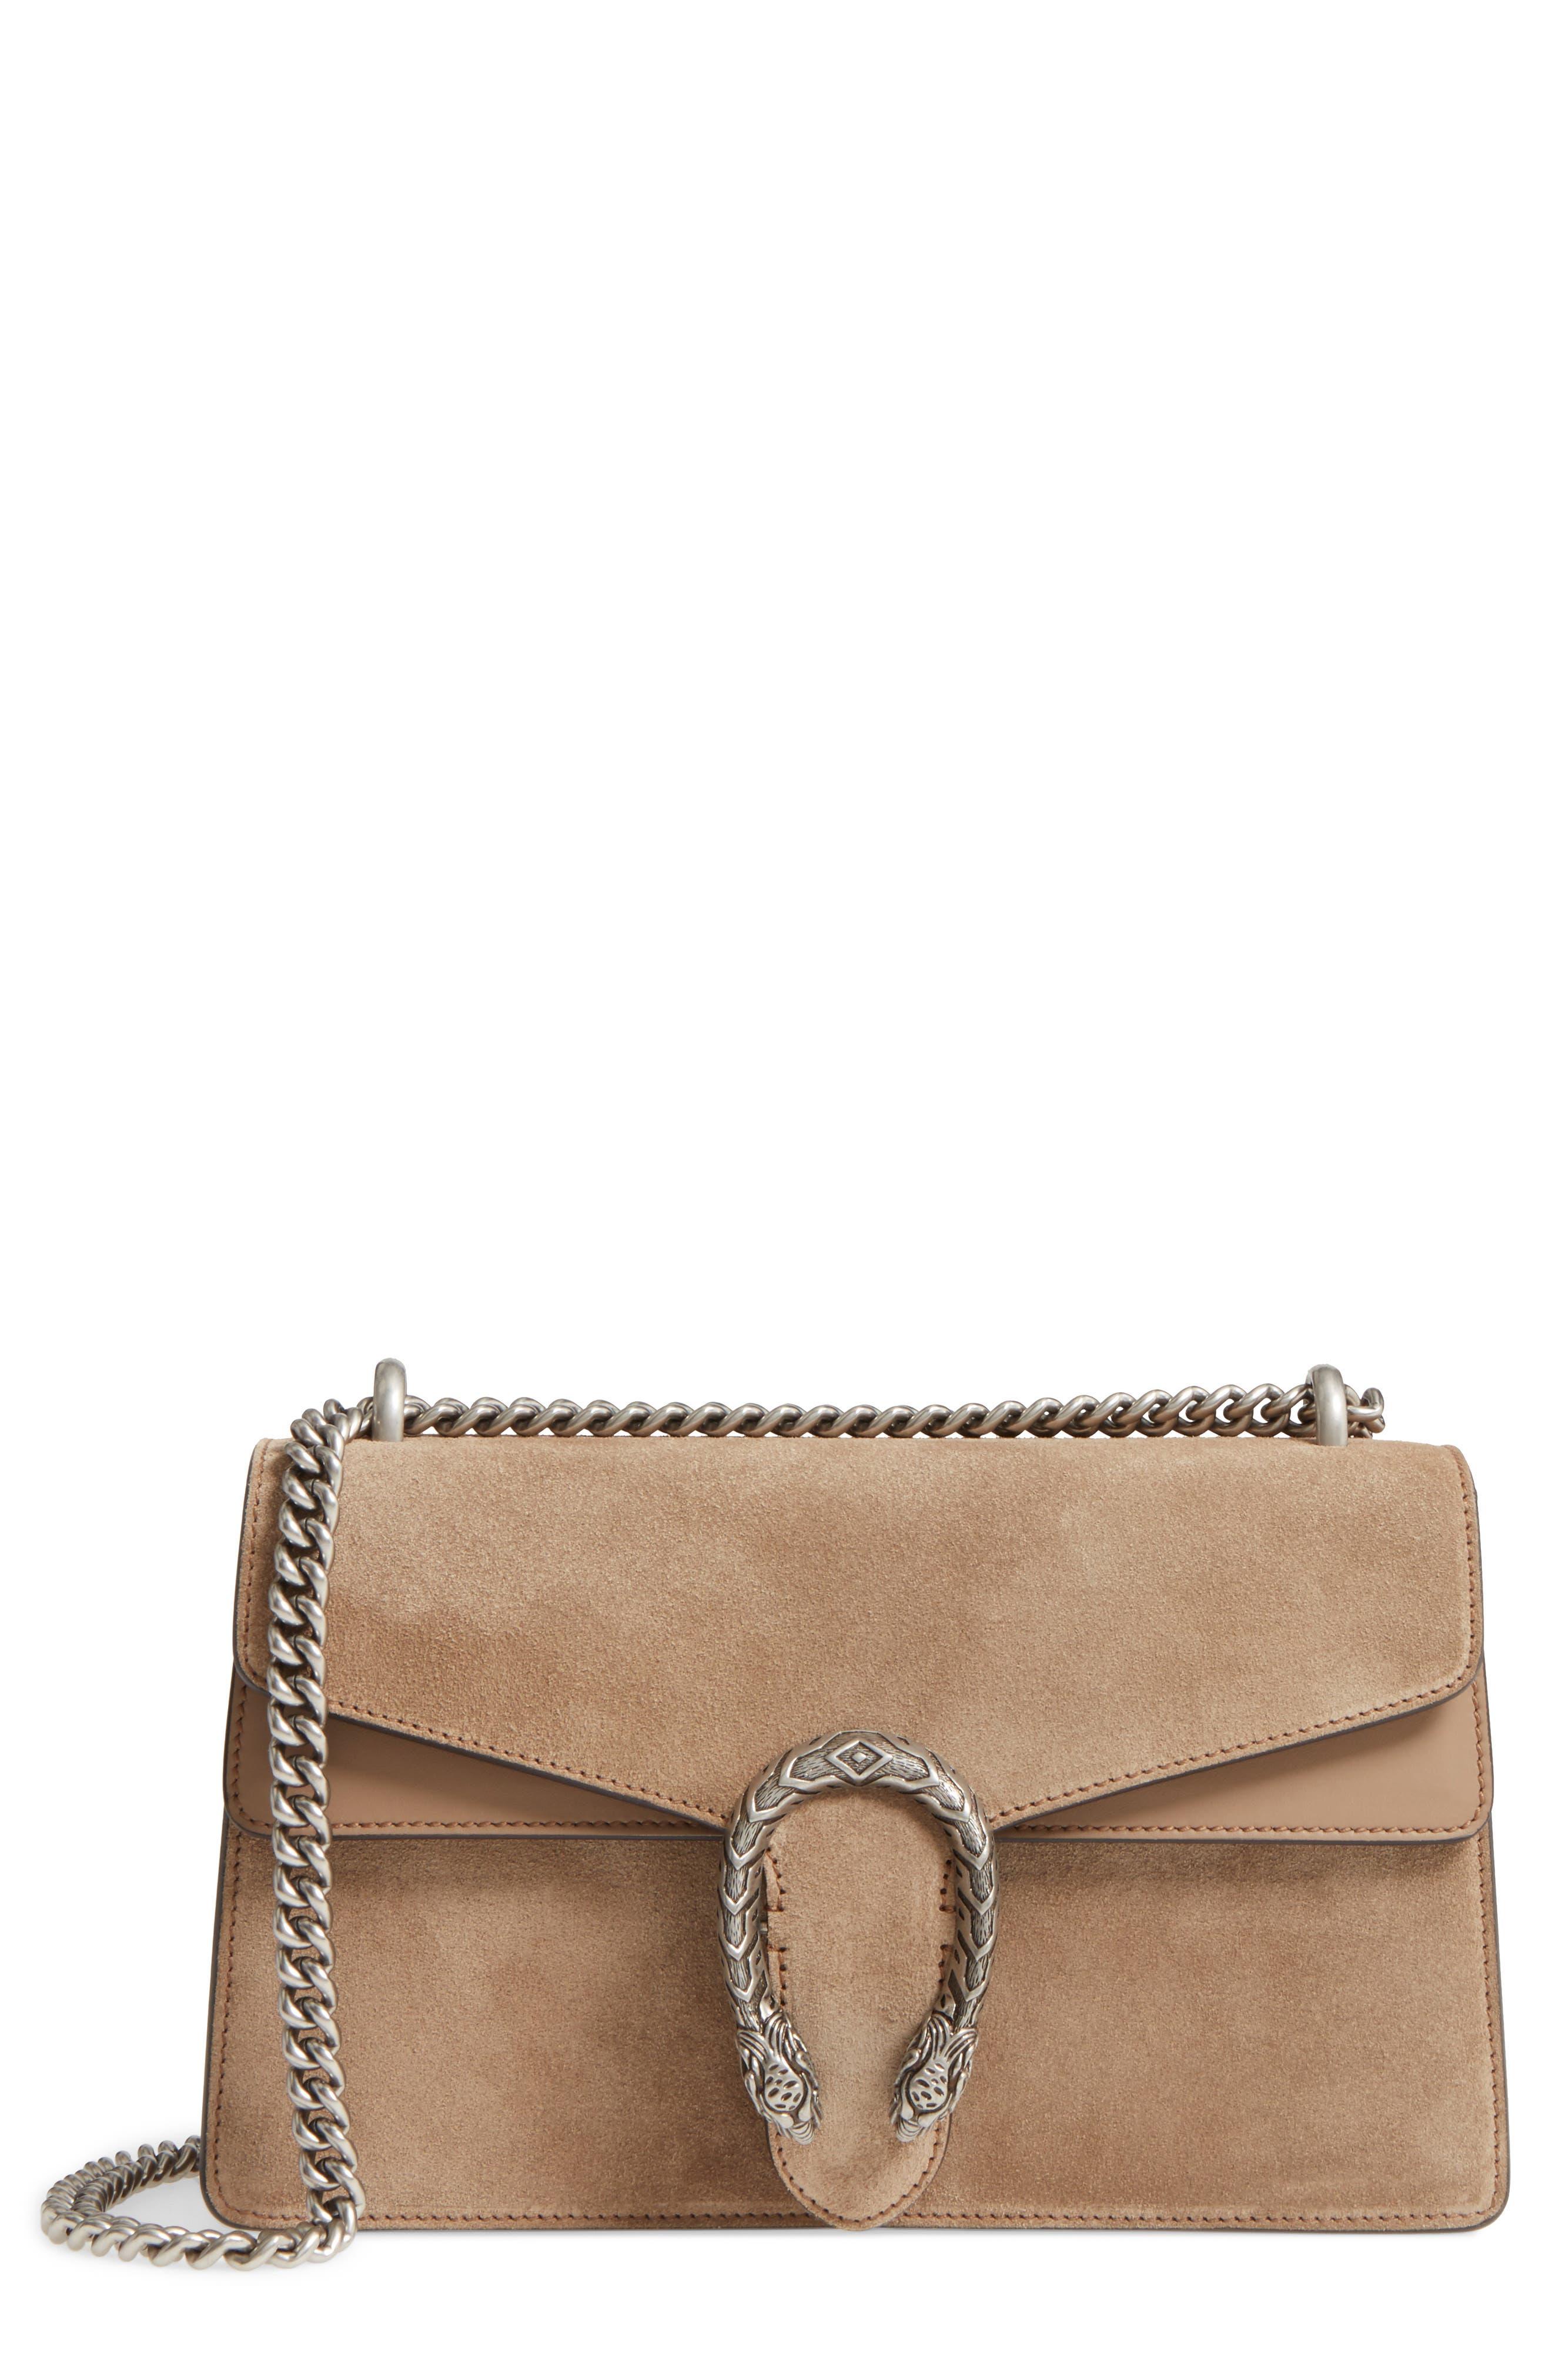 Small Dionysus Suede Shoulder Bag,                         Main,                         color, Taupe